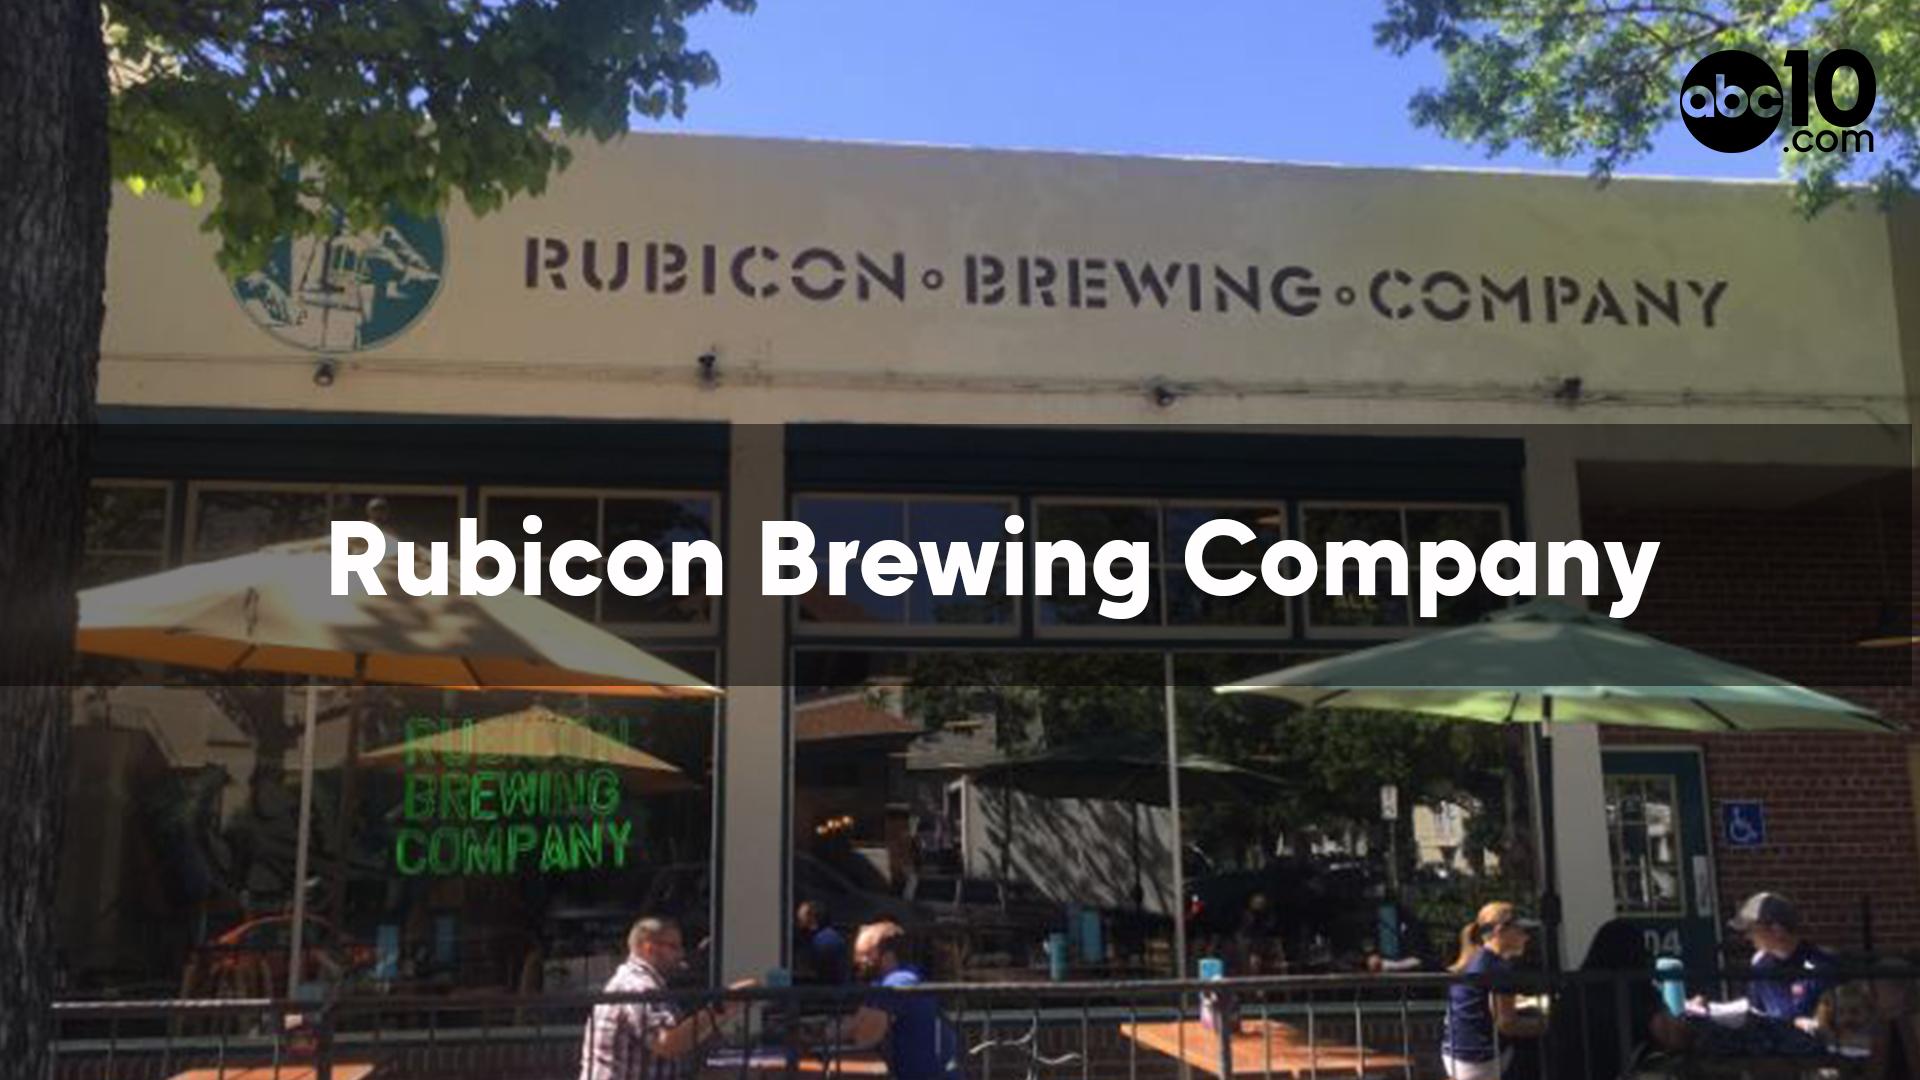 Food Near Rubicon Brewery